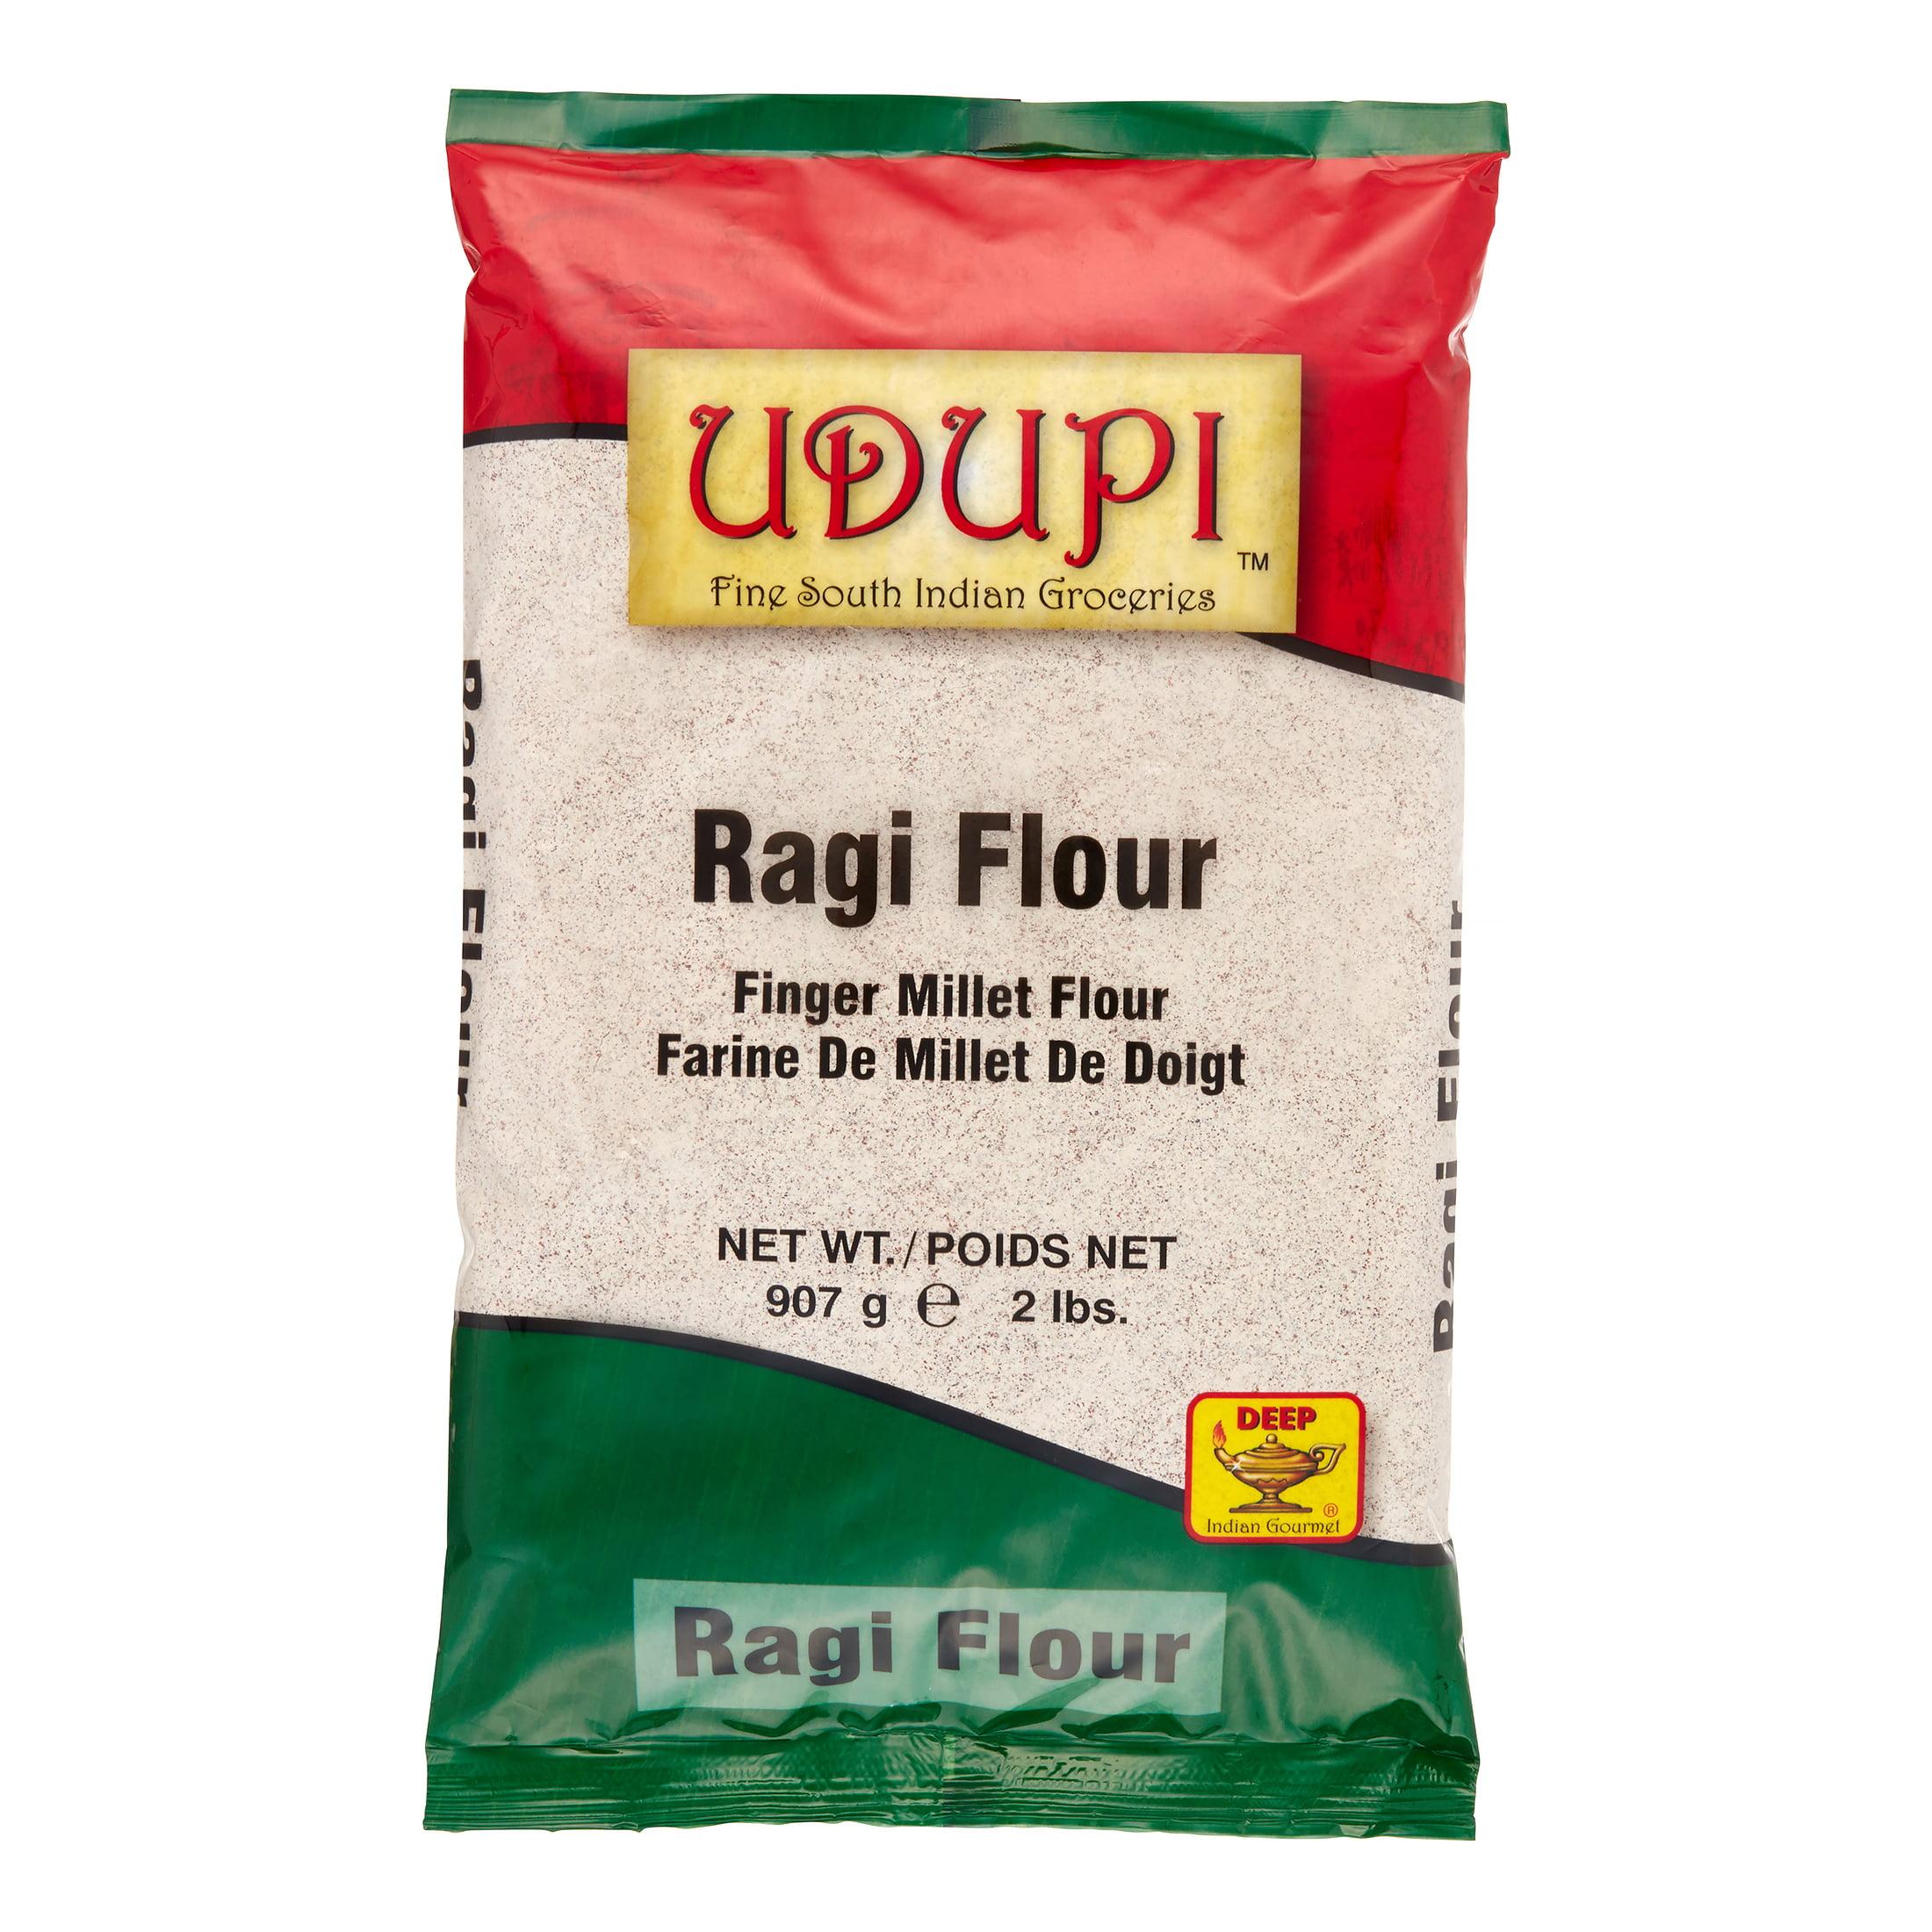 Deep udupi ragi flour finger millet flour 2 0 lb walmart com